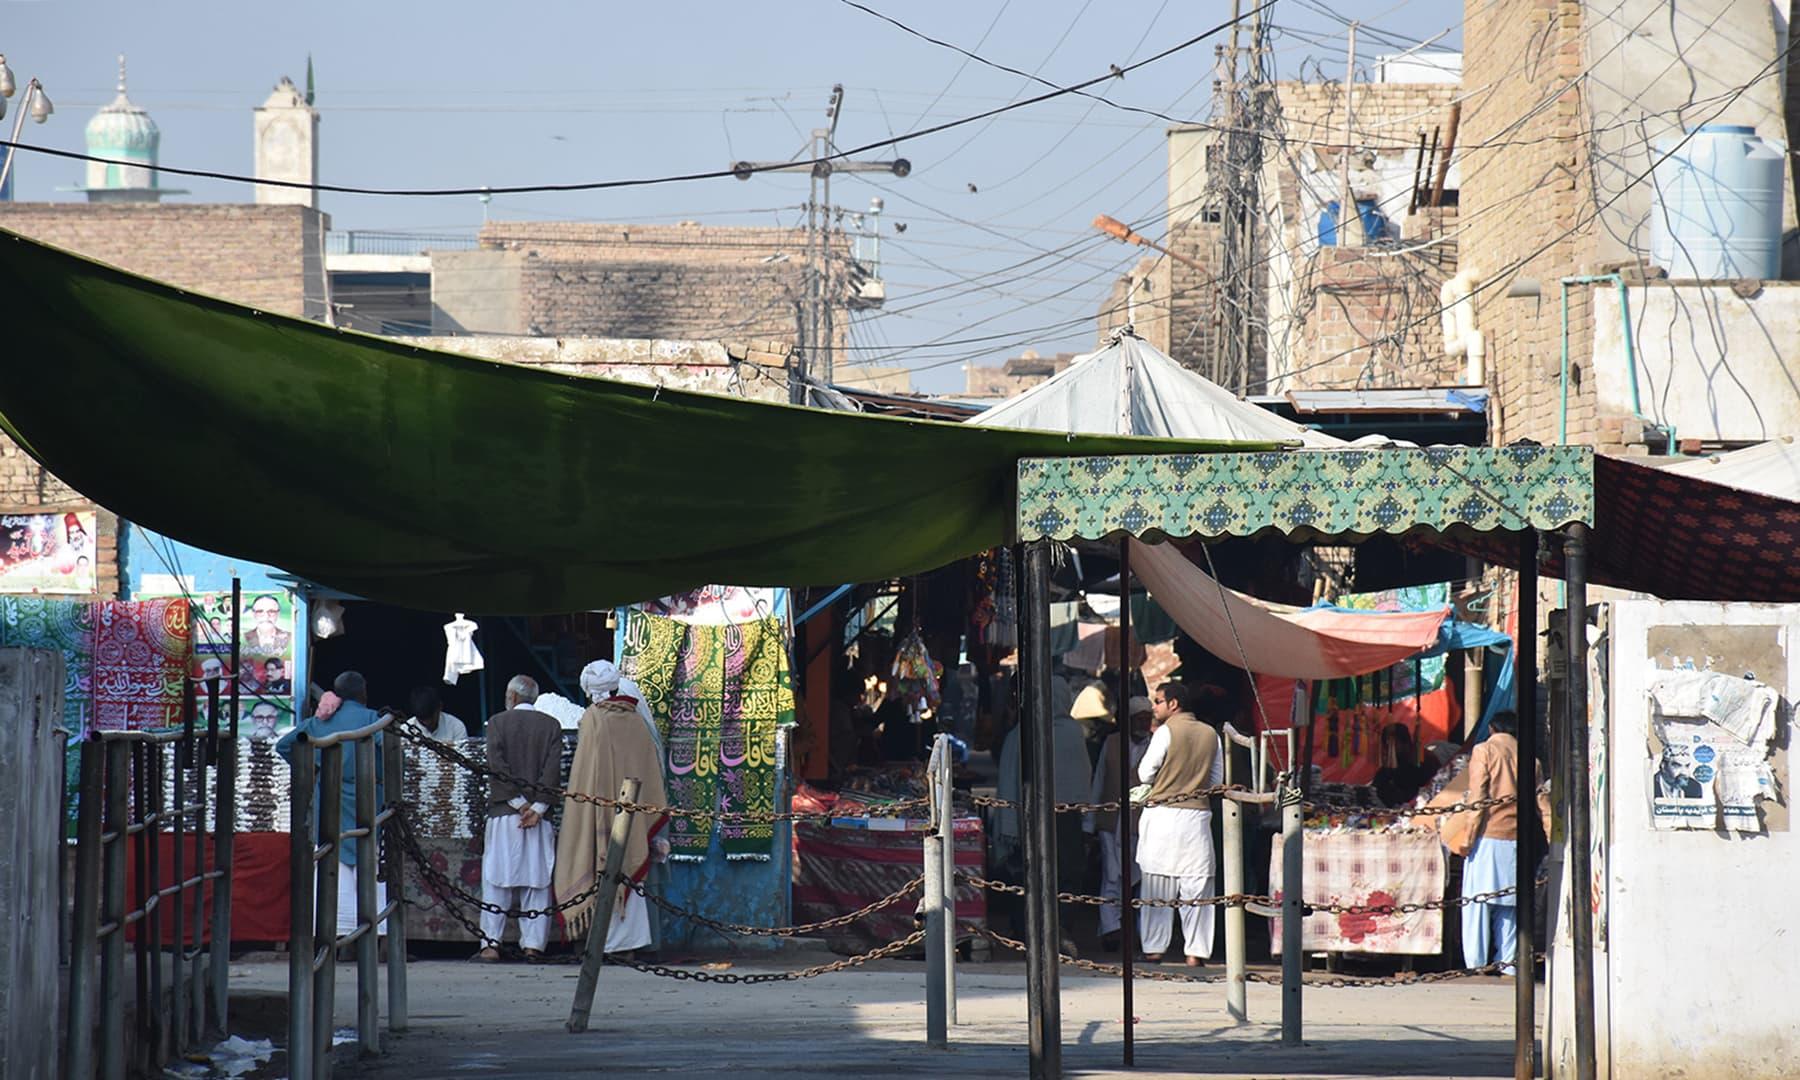 مزار کے پاس واقع بازار کا ایک منظر—تصویر رمضان رفیق